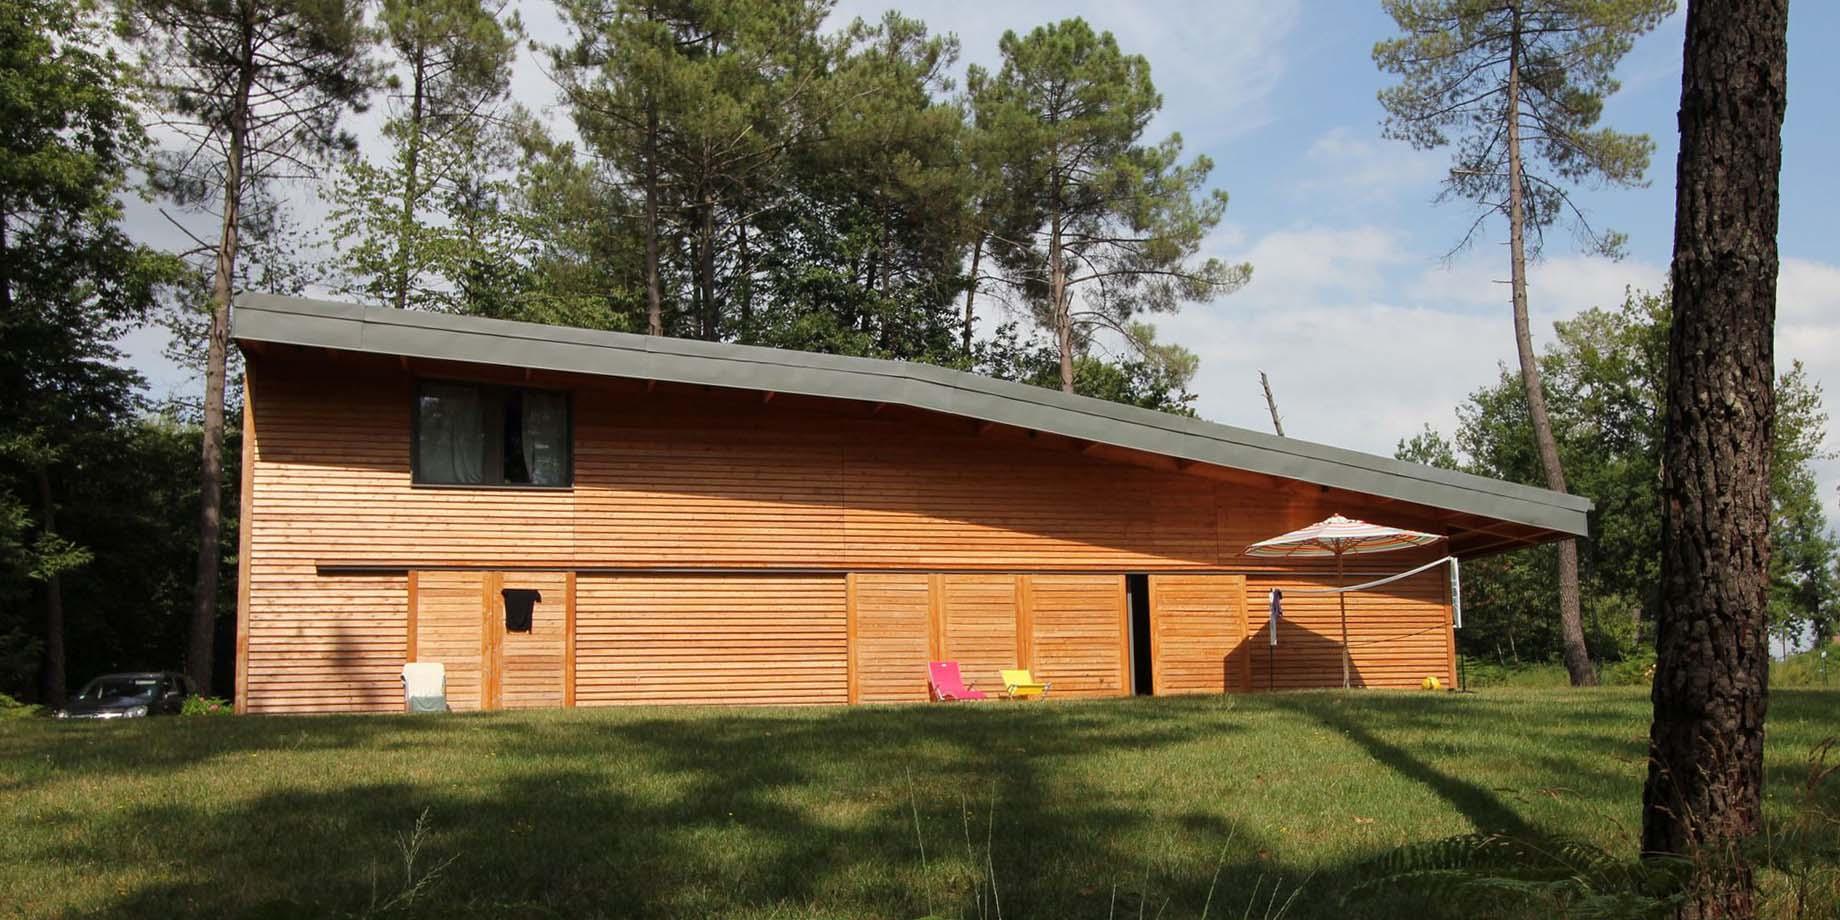 maskarade-architecture-maison-bois-vacances-bardage-meleze-volet-coulissante